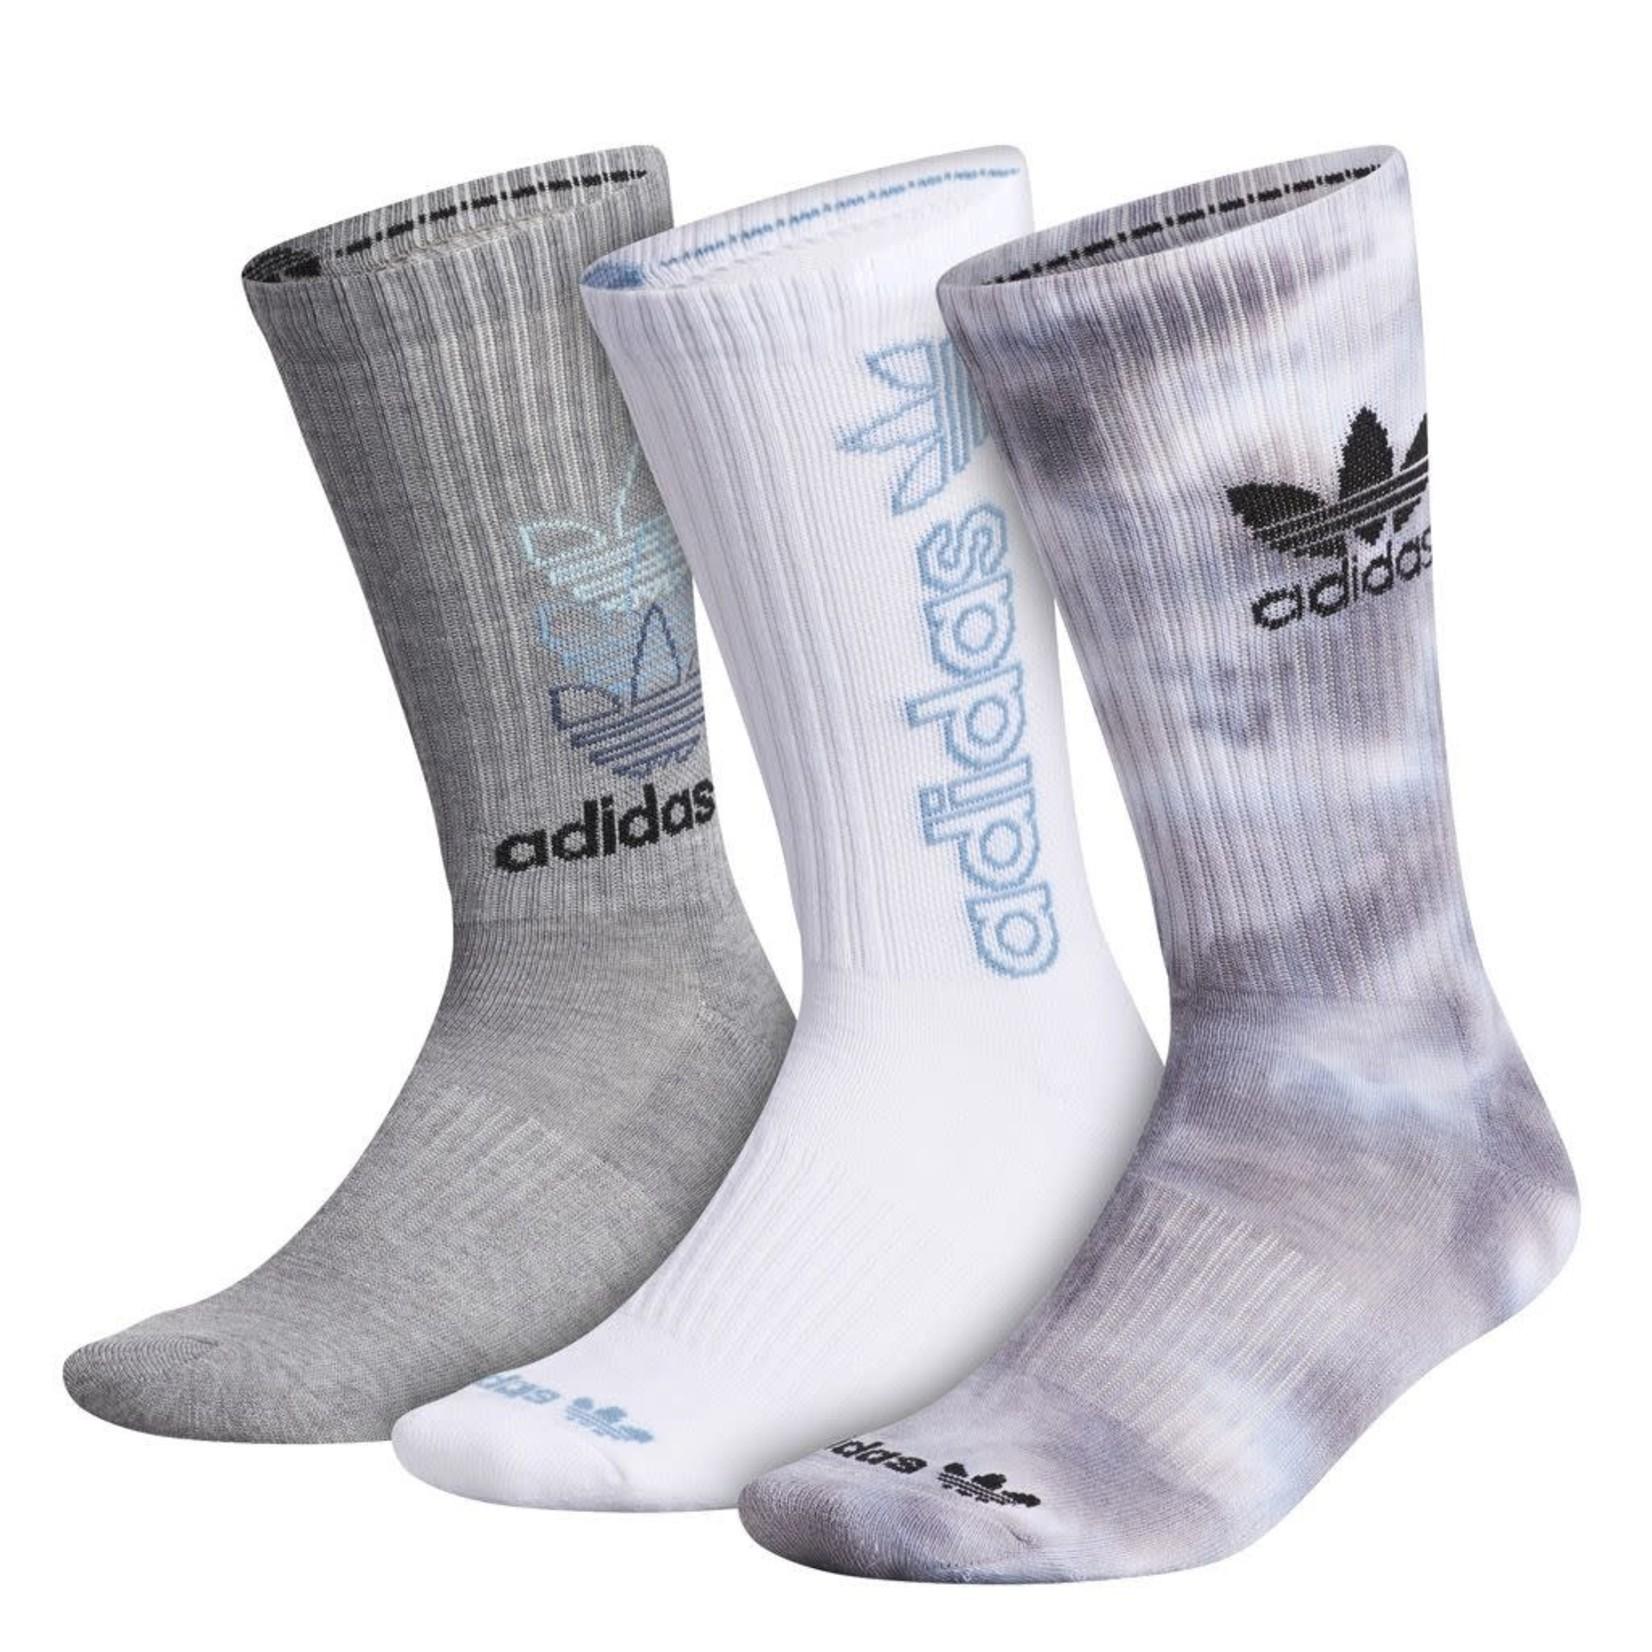 Adidas Adidas : Men's Originals Colorwash 3pack Socks